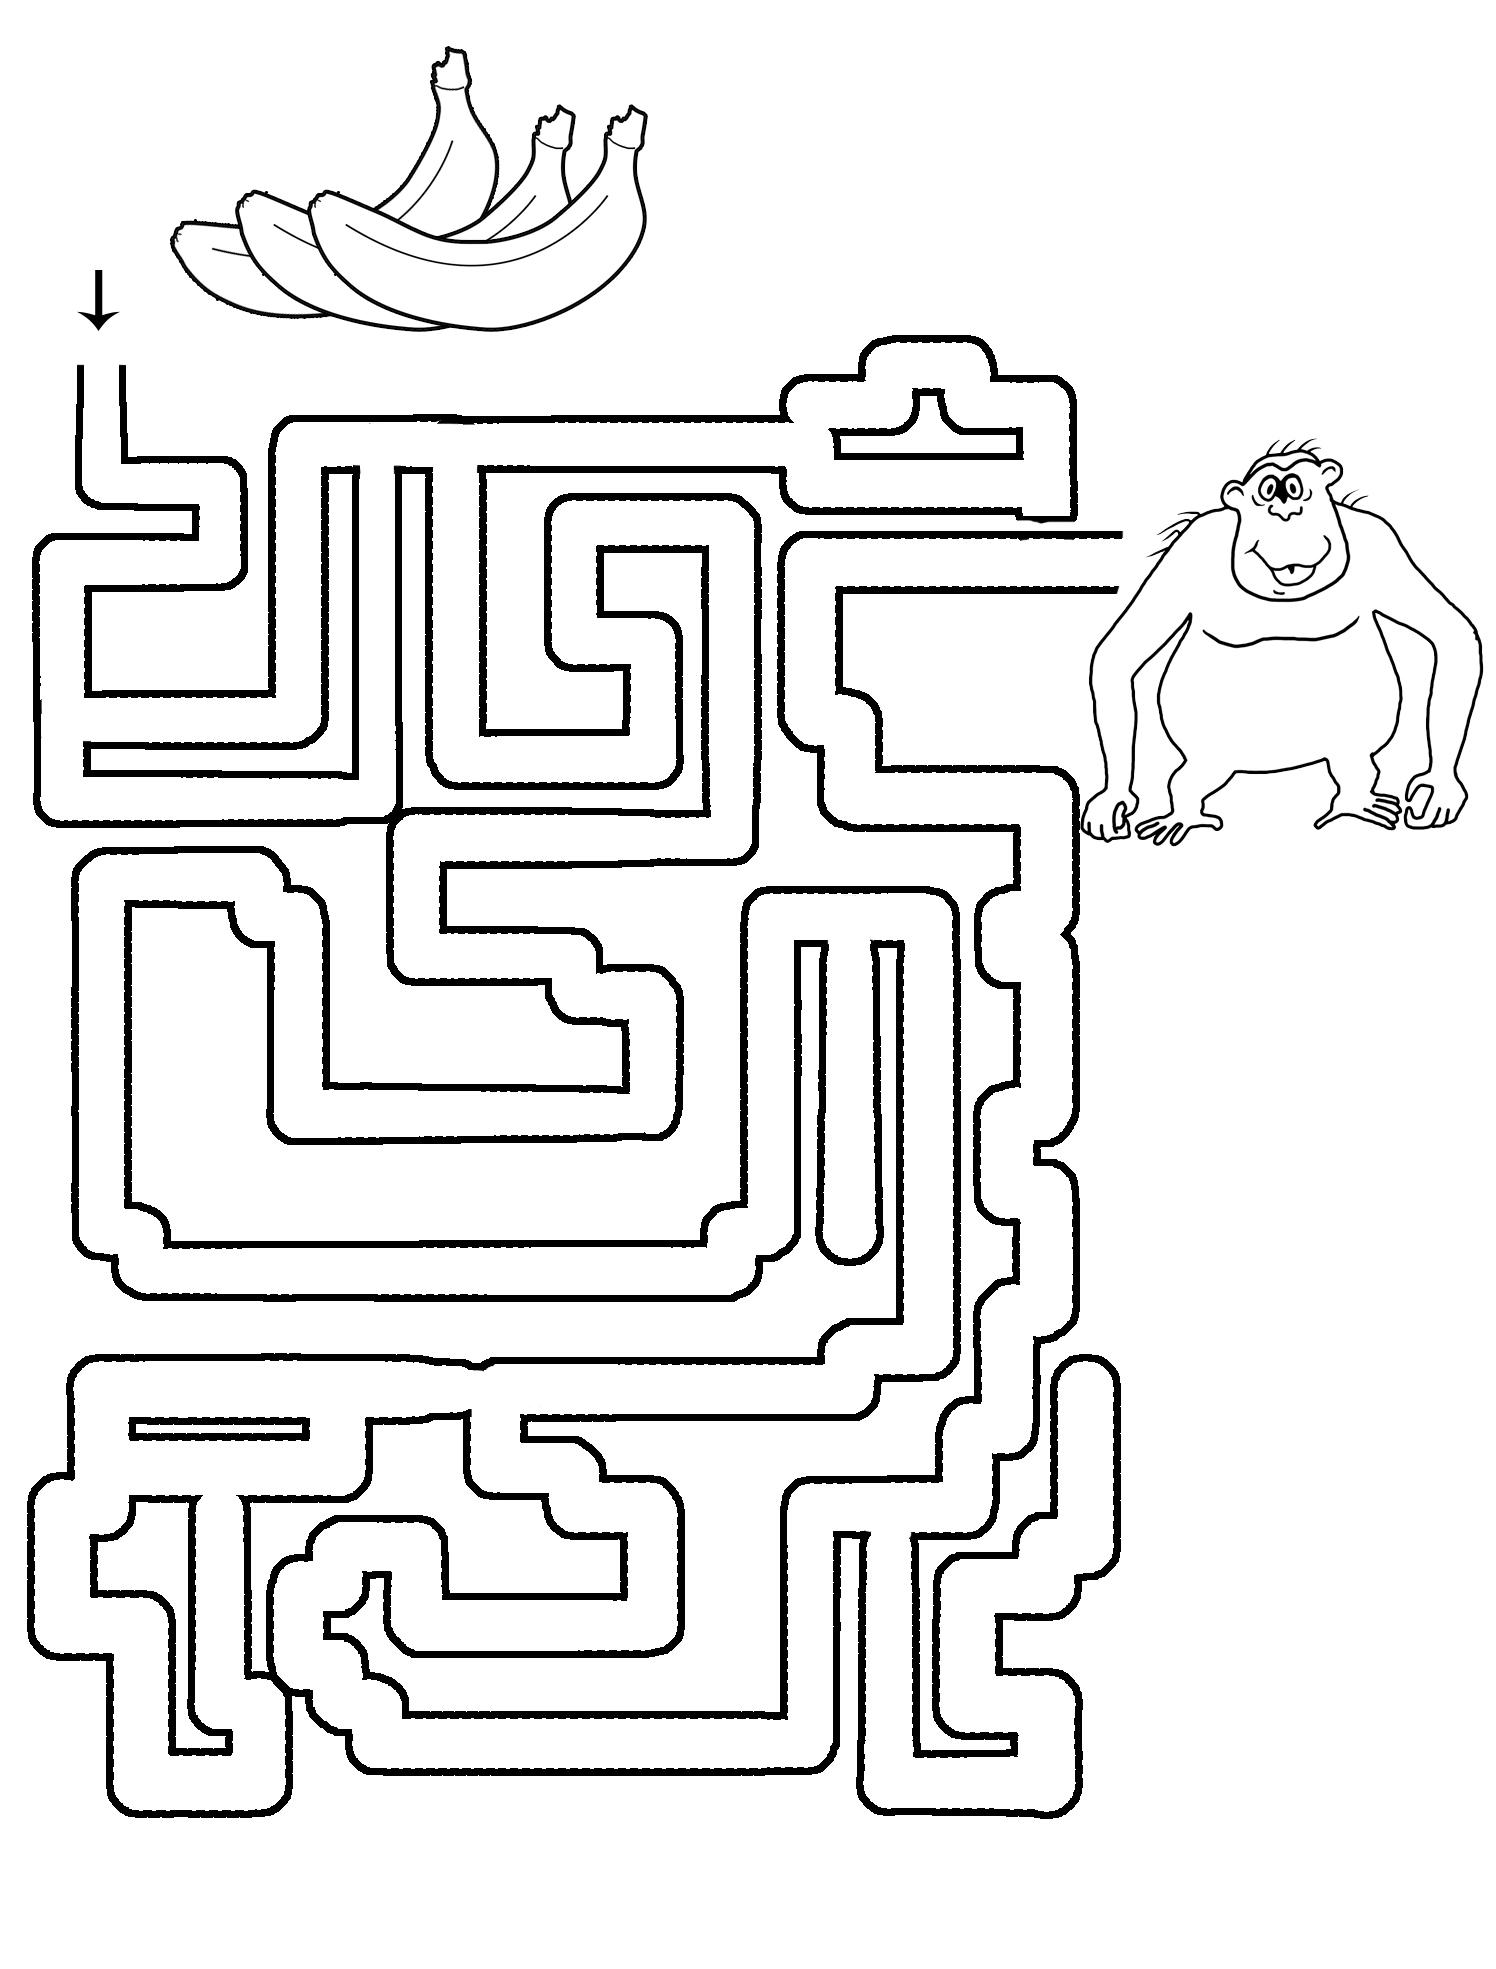 printable maze with gorilla and bananas